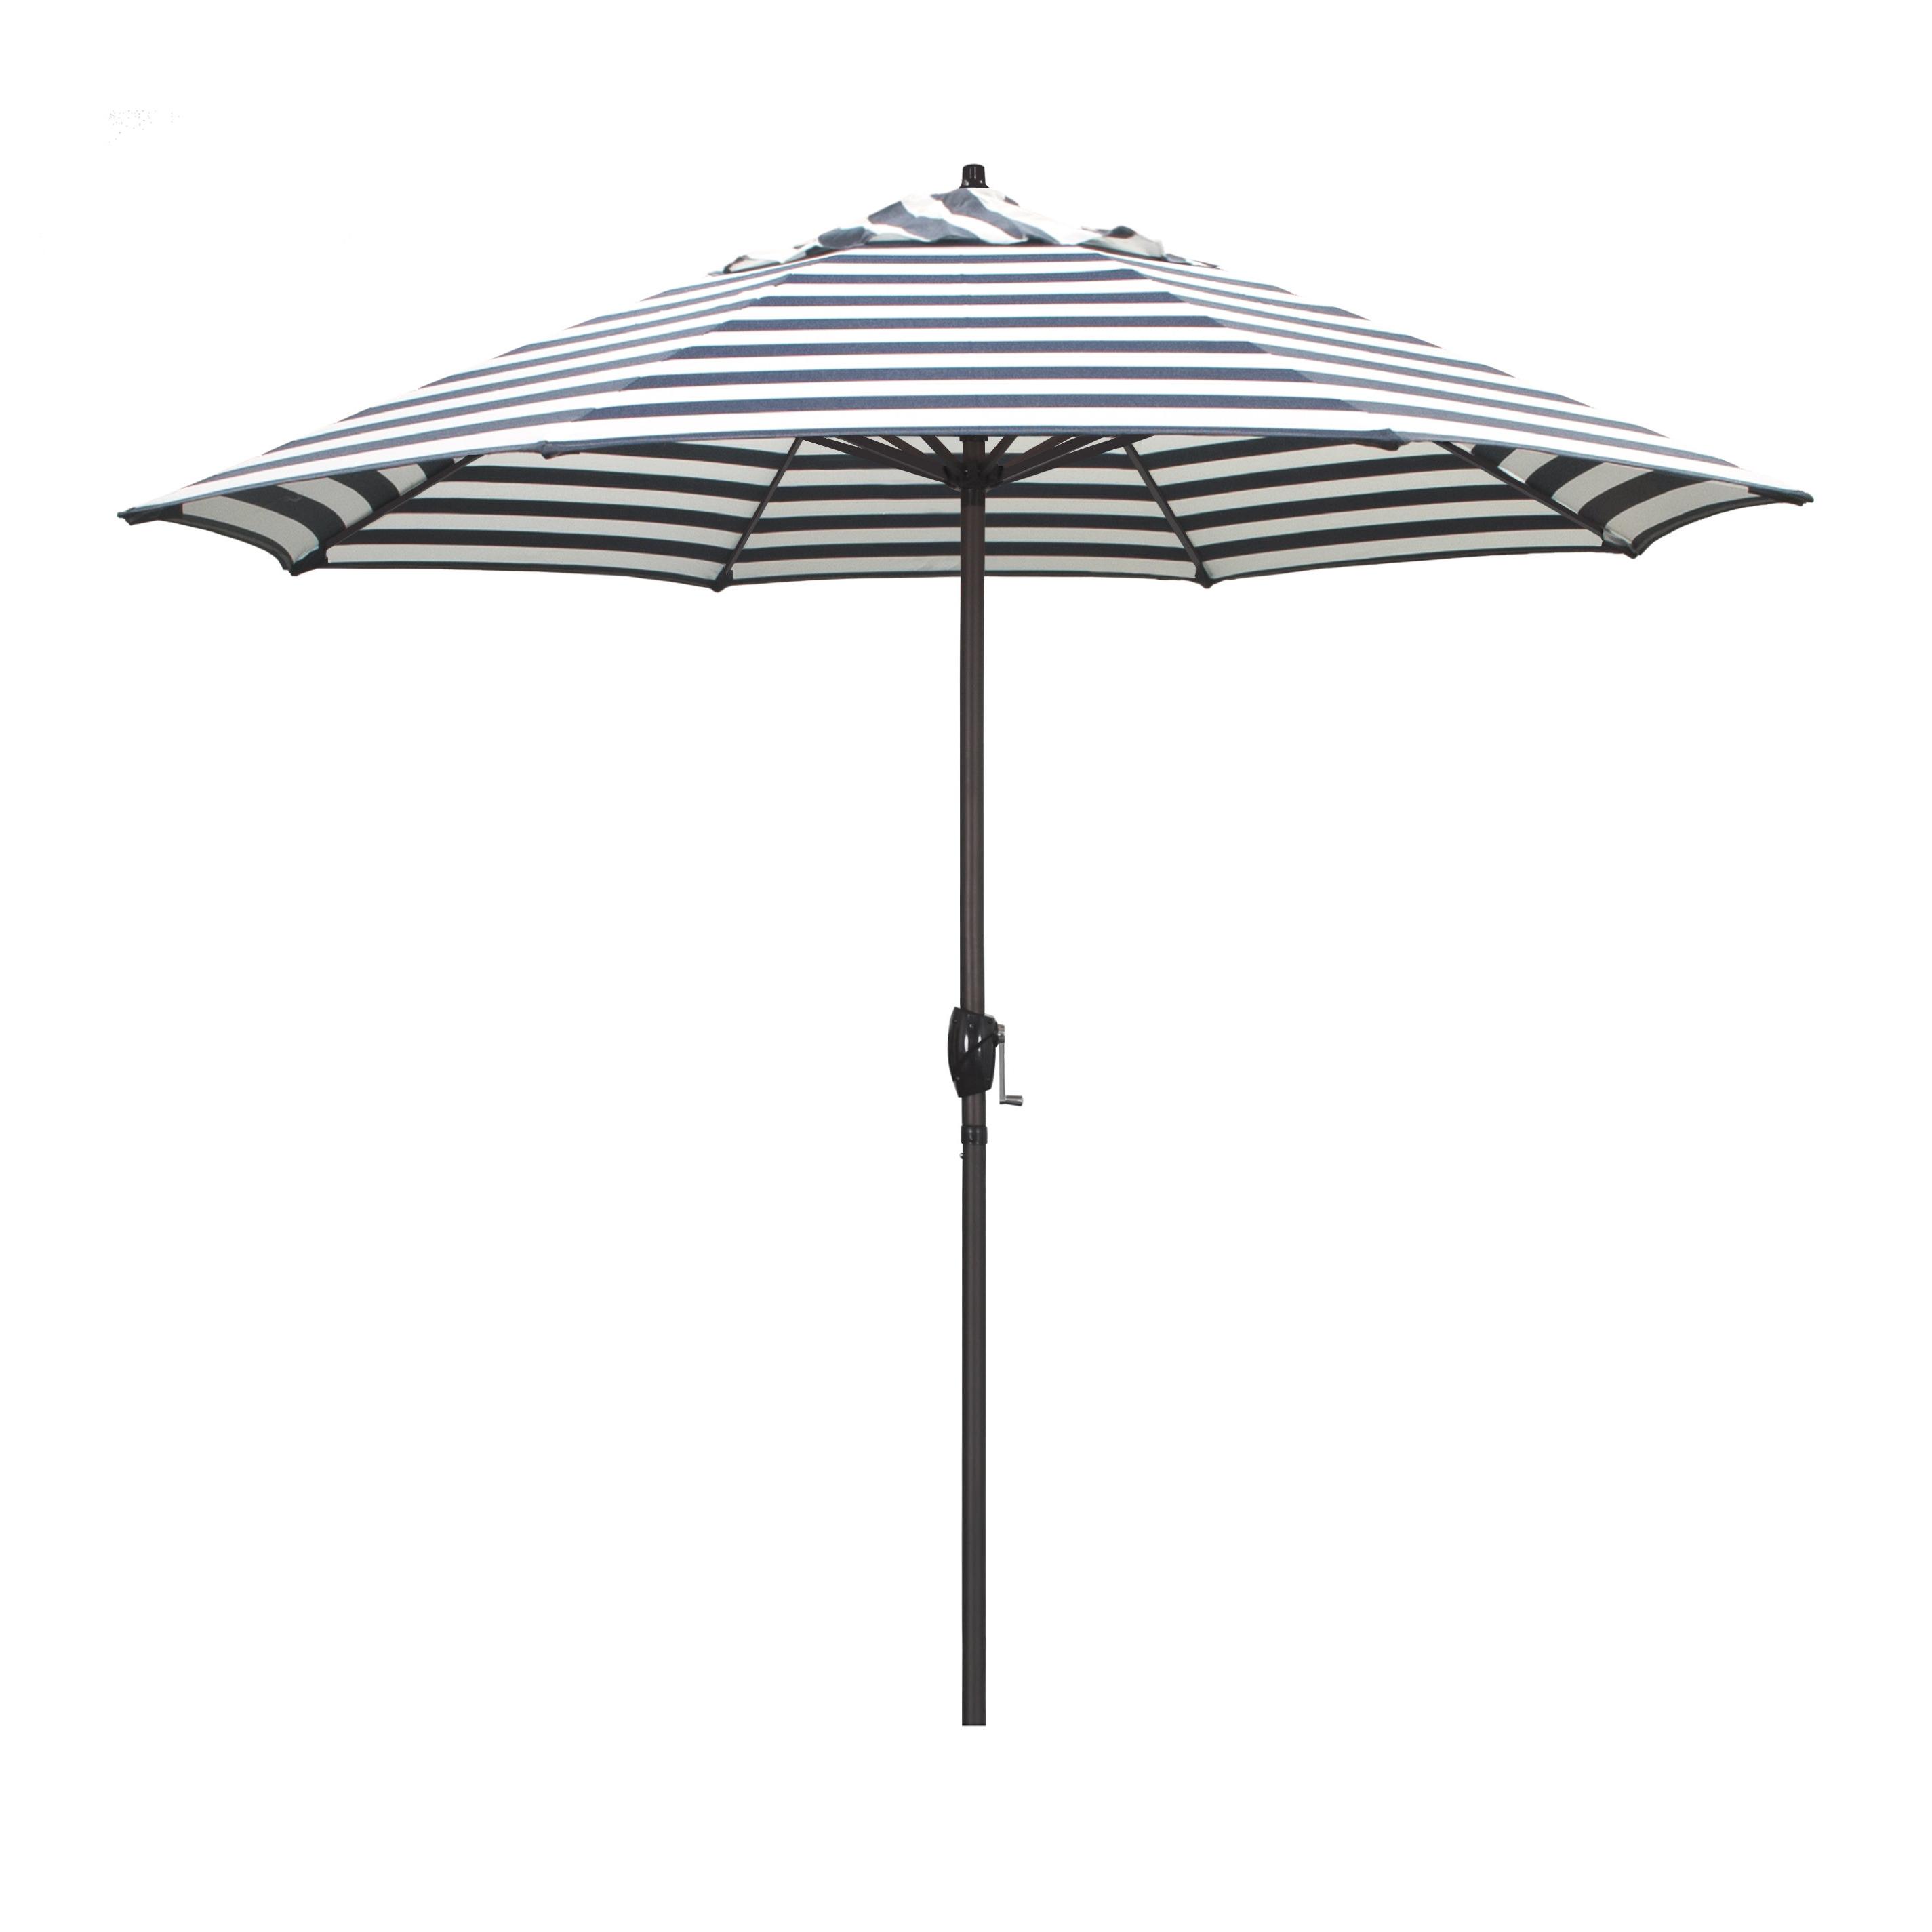 Monty Market Umbrellas Intended For Most Popular Sol 72 Outdoor Cardine 9' Market Umbrella (Gallery 12 of 20)